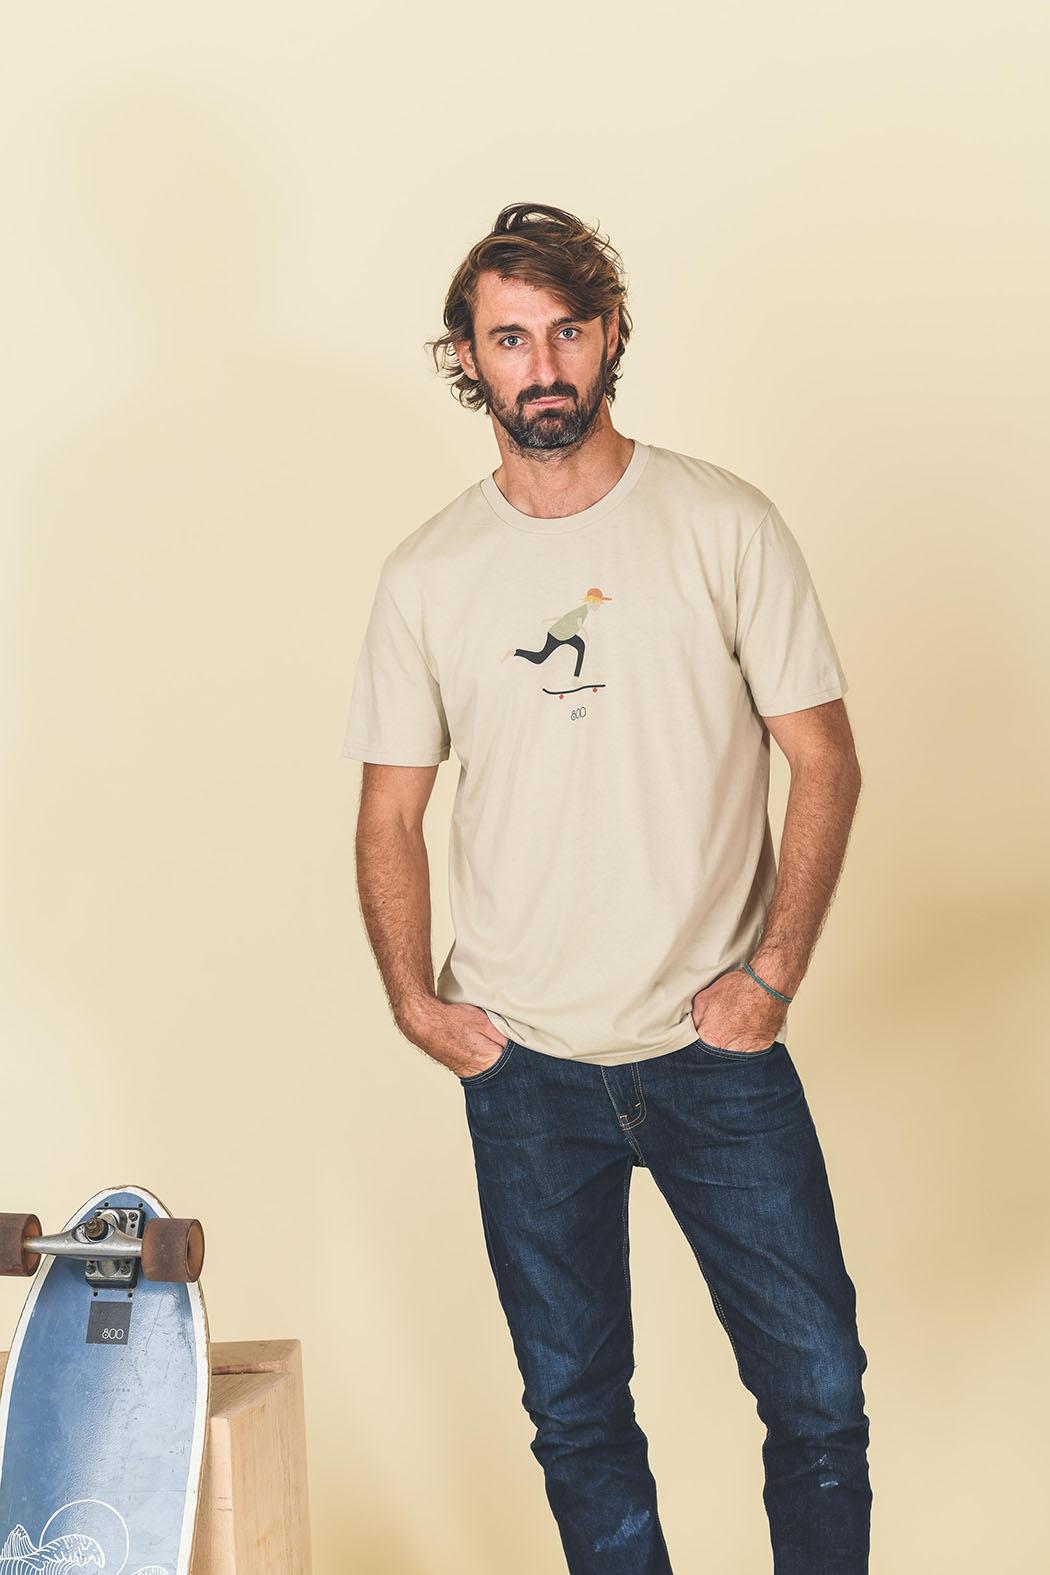 Laurent-scavone-photographe-mode-studio-lille-675